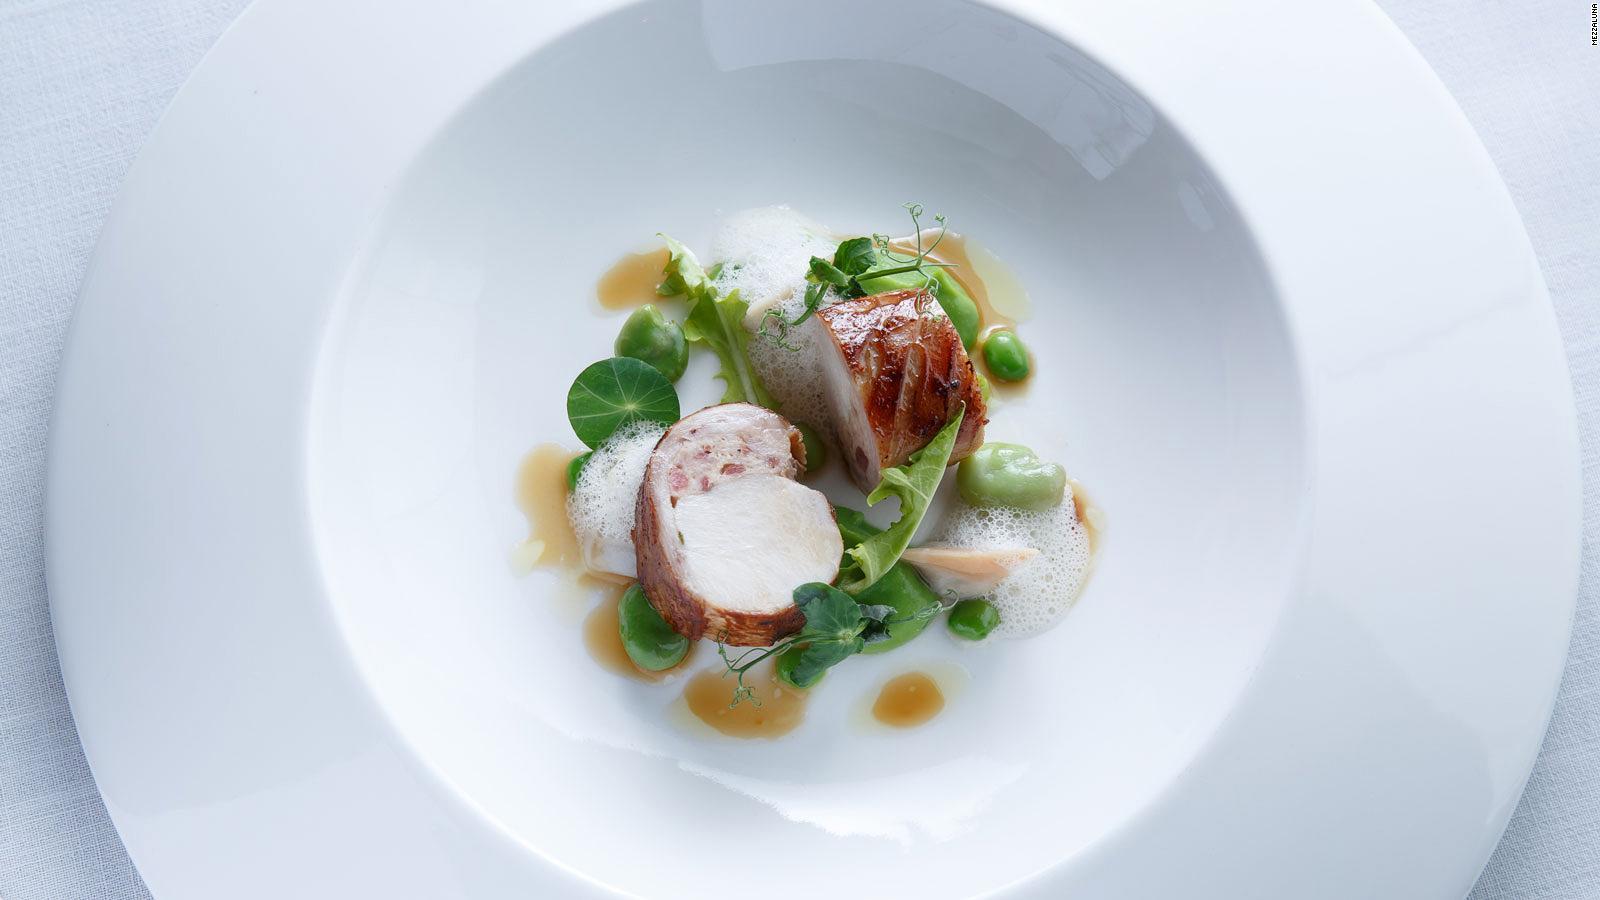 Bangkoks First Michelin Guide Showcases Culinary Stars